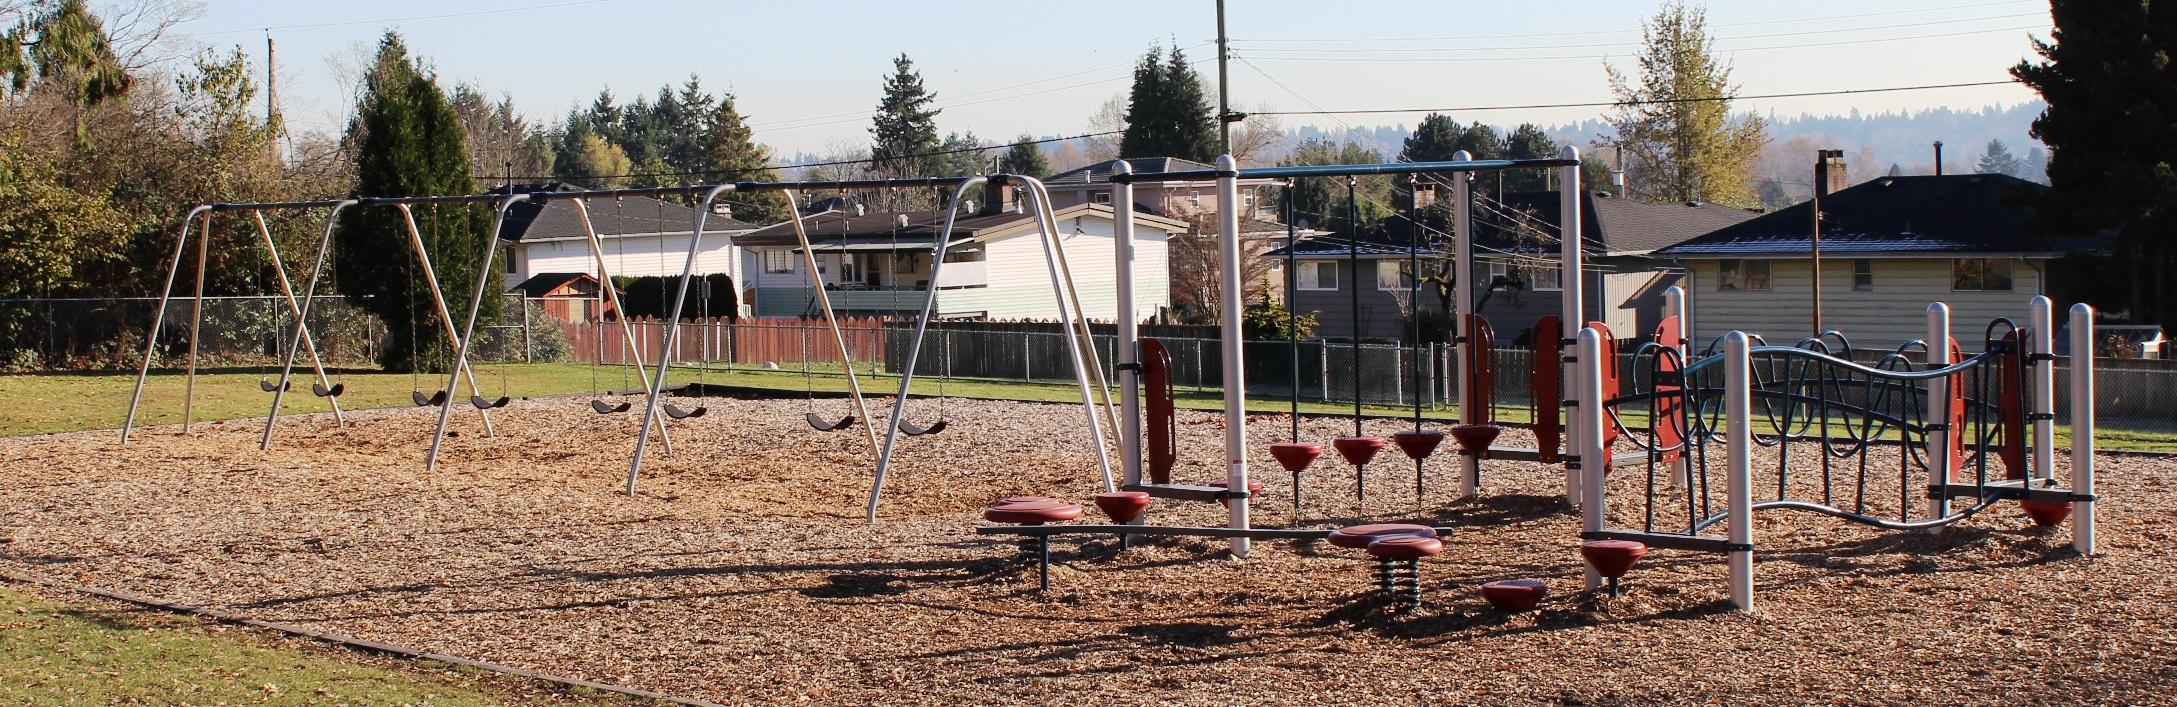 Sperling Elementary Playground